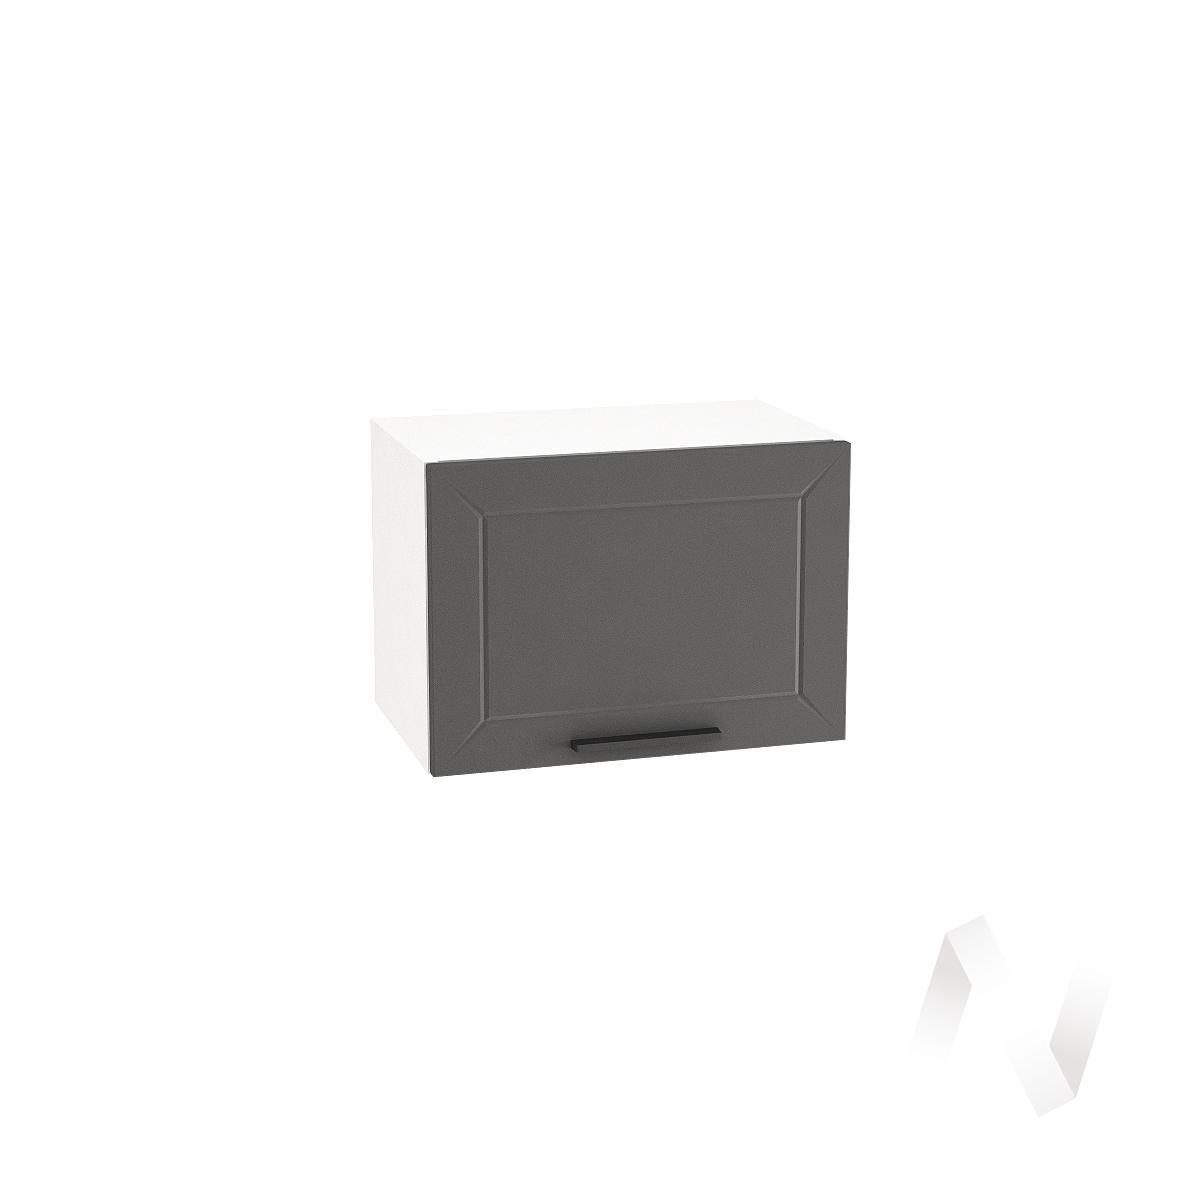 "Кухня ""Глетчер"": Шкаф верхний горизонтальный 500, ШВГ 500 (Маренго силк/корпус белый)"